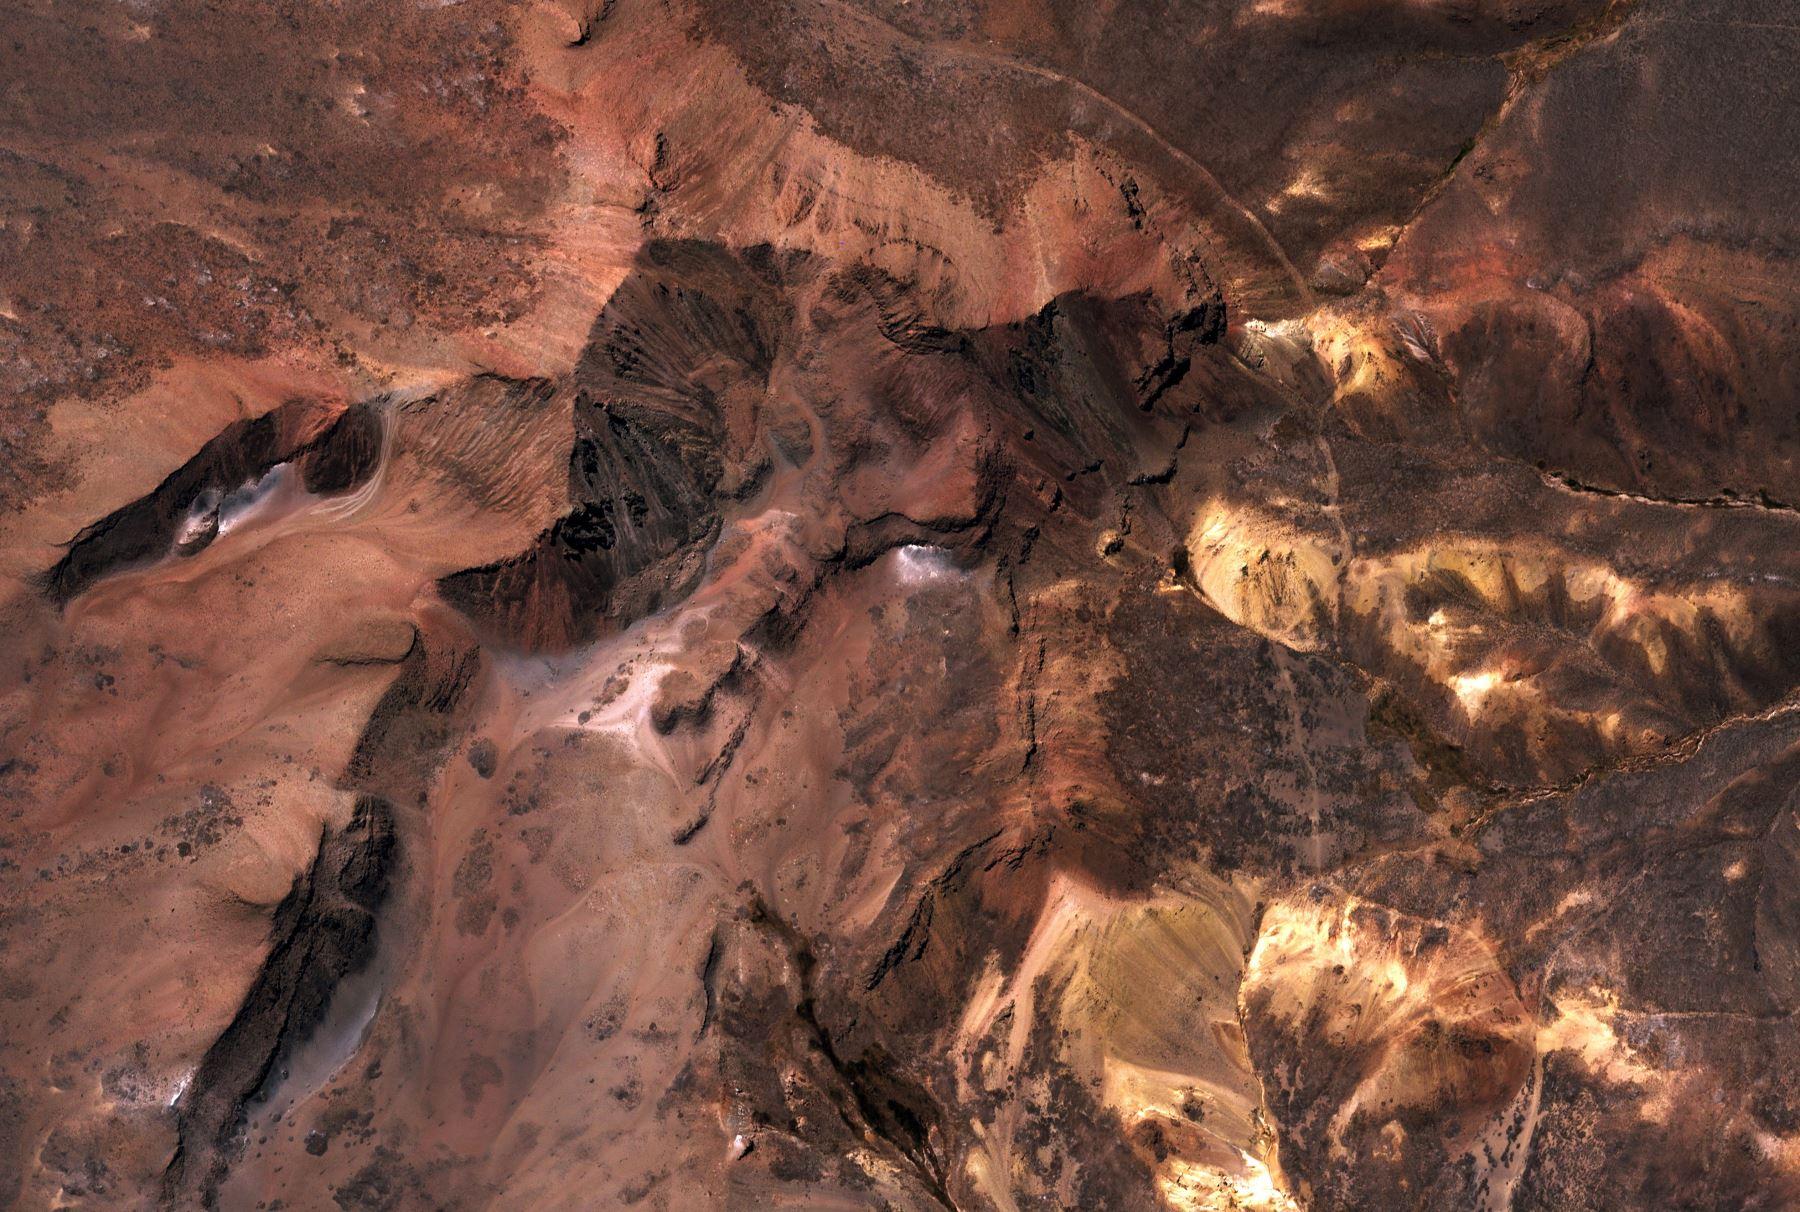 Perùsat - Première image - First image - Volcan Misti - Pérou - Perù - satellite - CONIDA